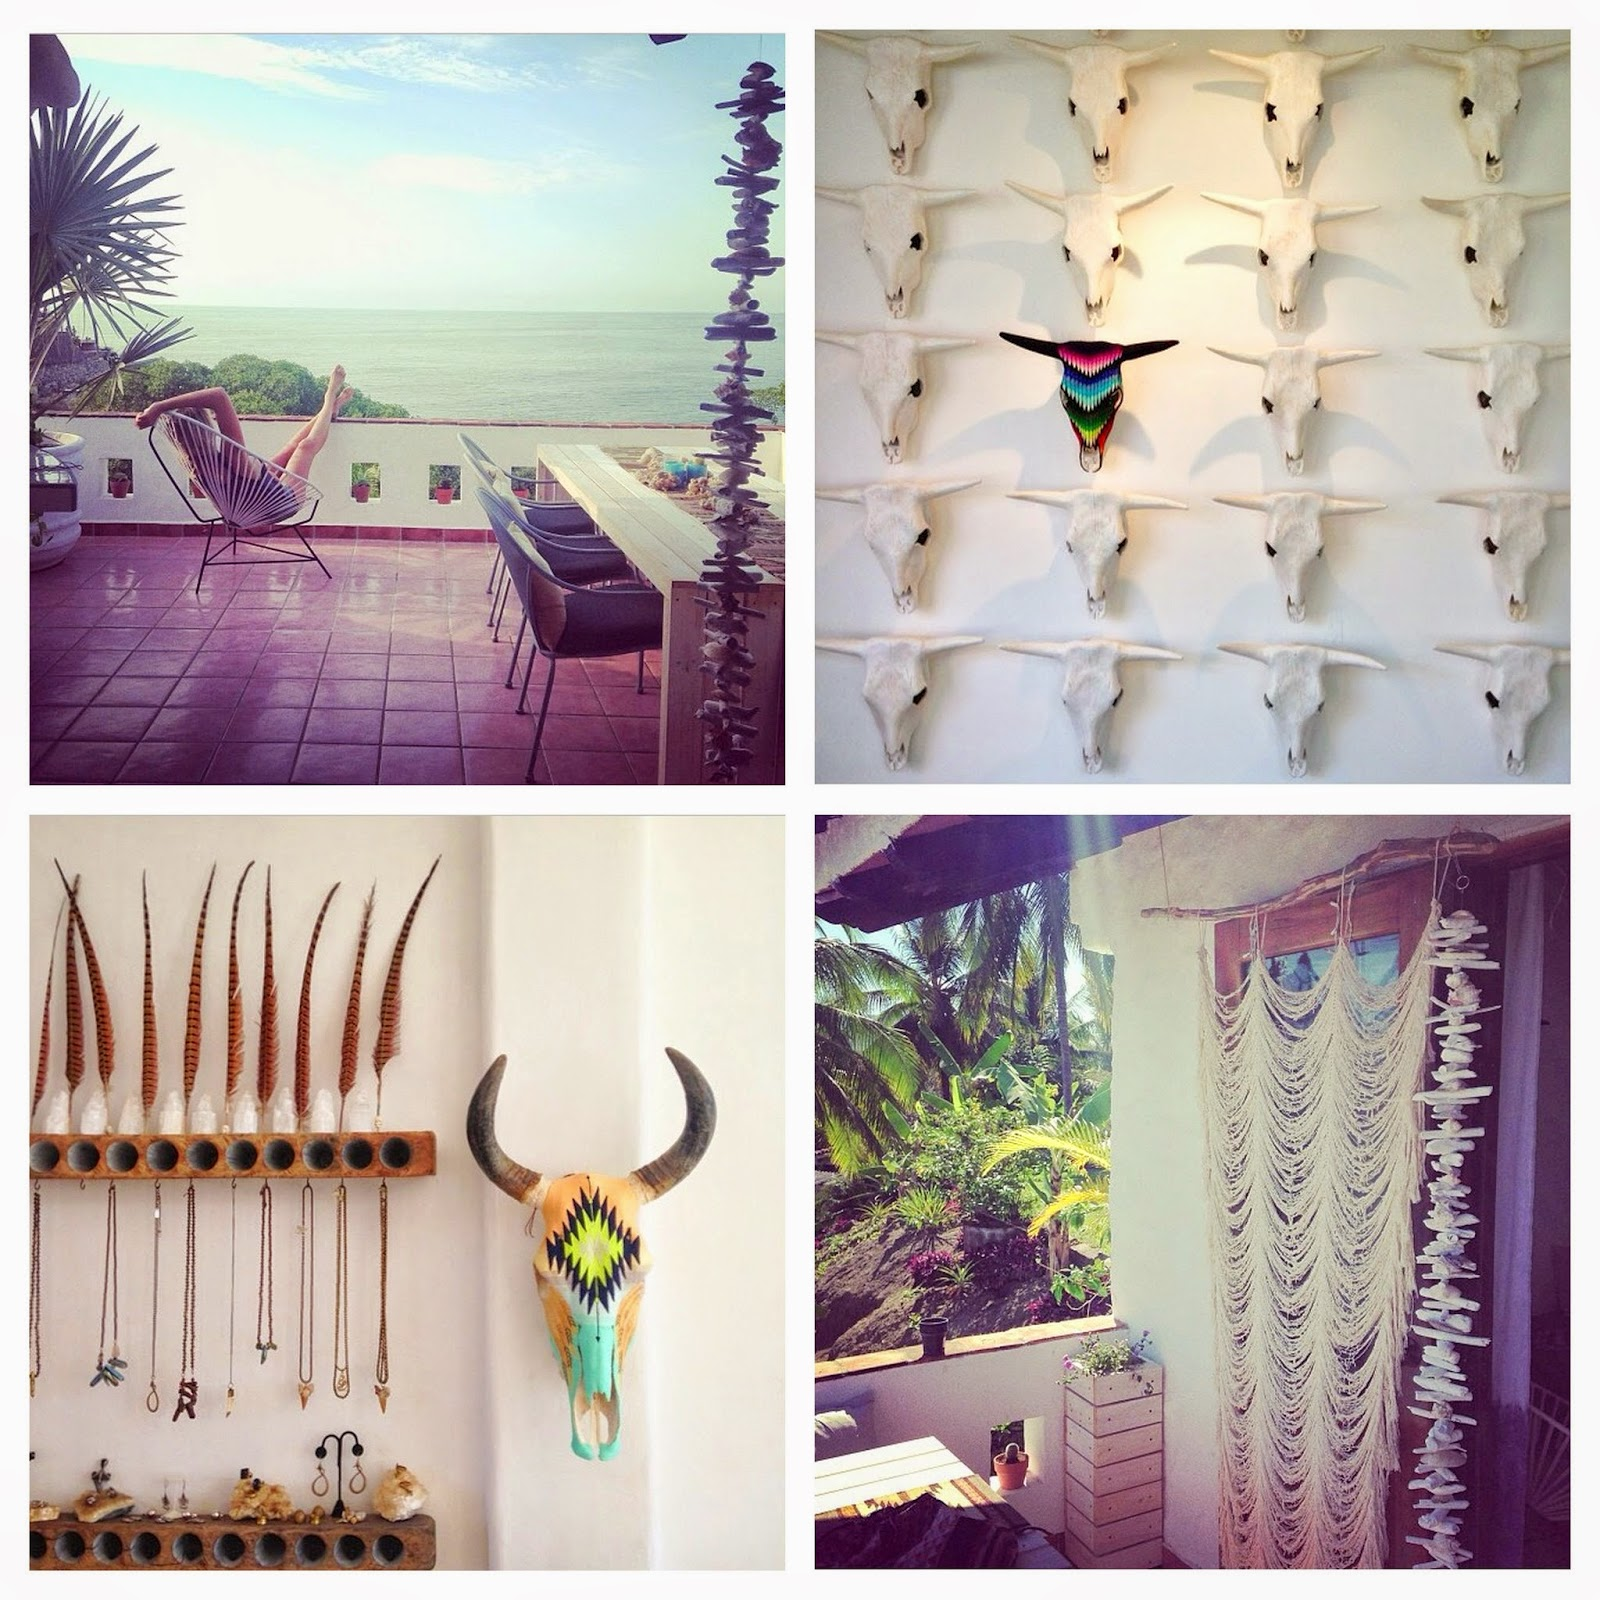 evoke the spirit,sayulita,bohème,hippienchic,mode,déco,mexique,surf